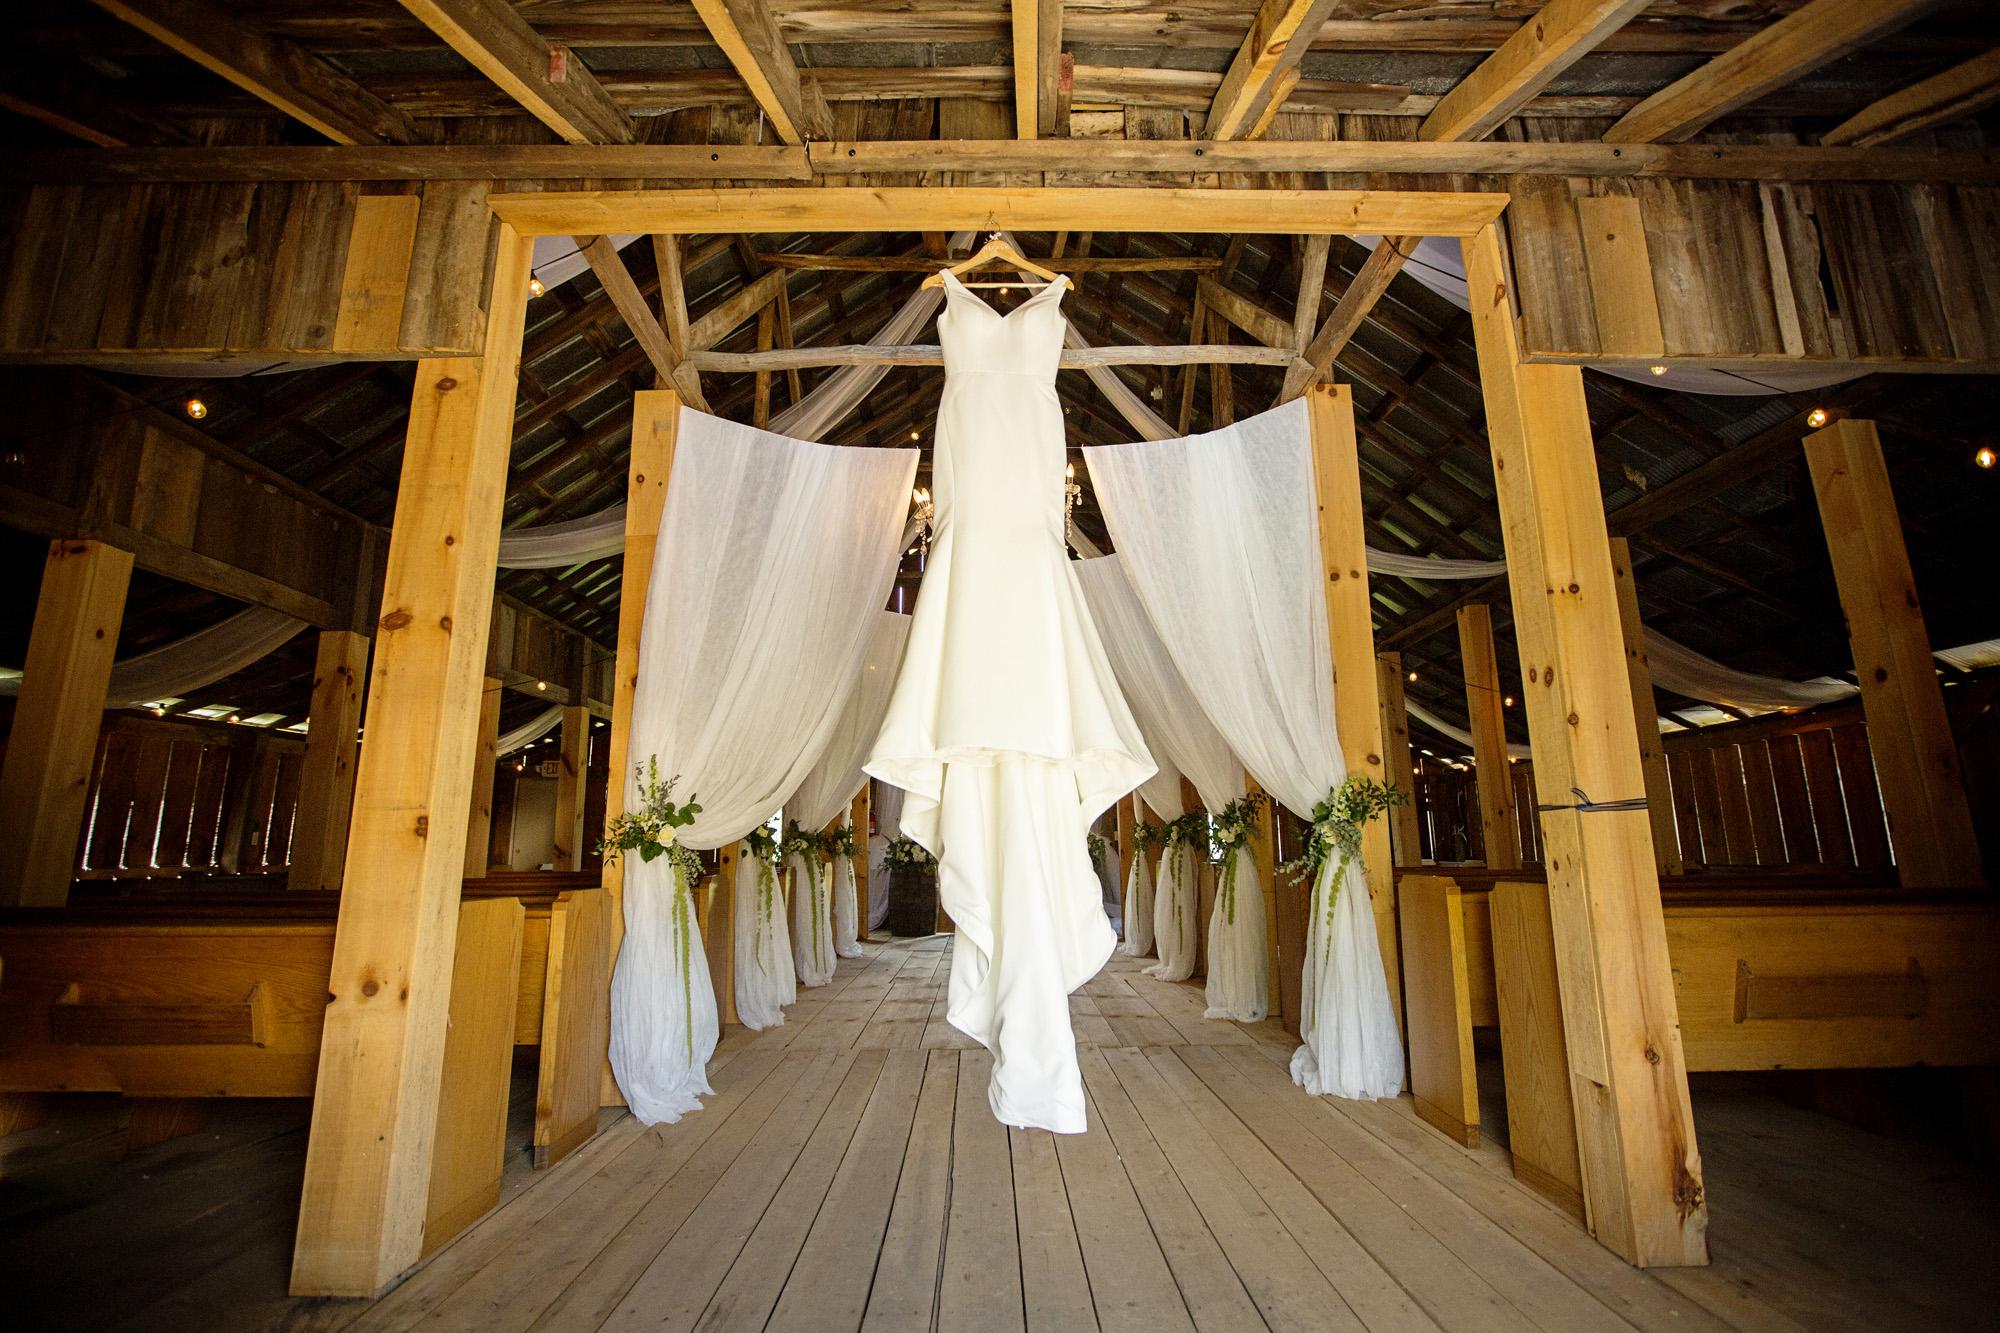 Seriously_Sabrina_Photography_Red_River_Gorge_Wedding_Barn_Robinson4.jpg